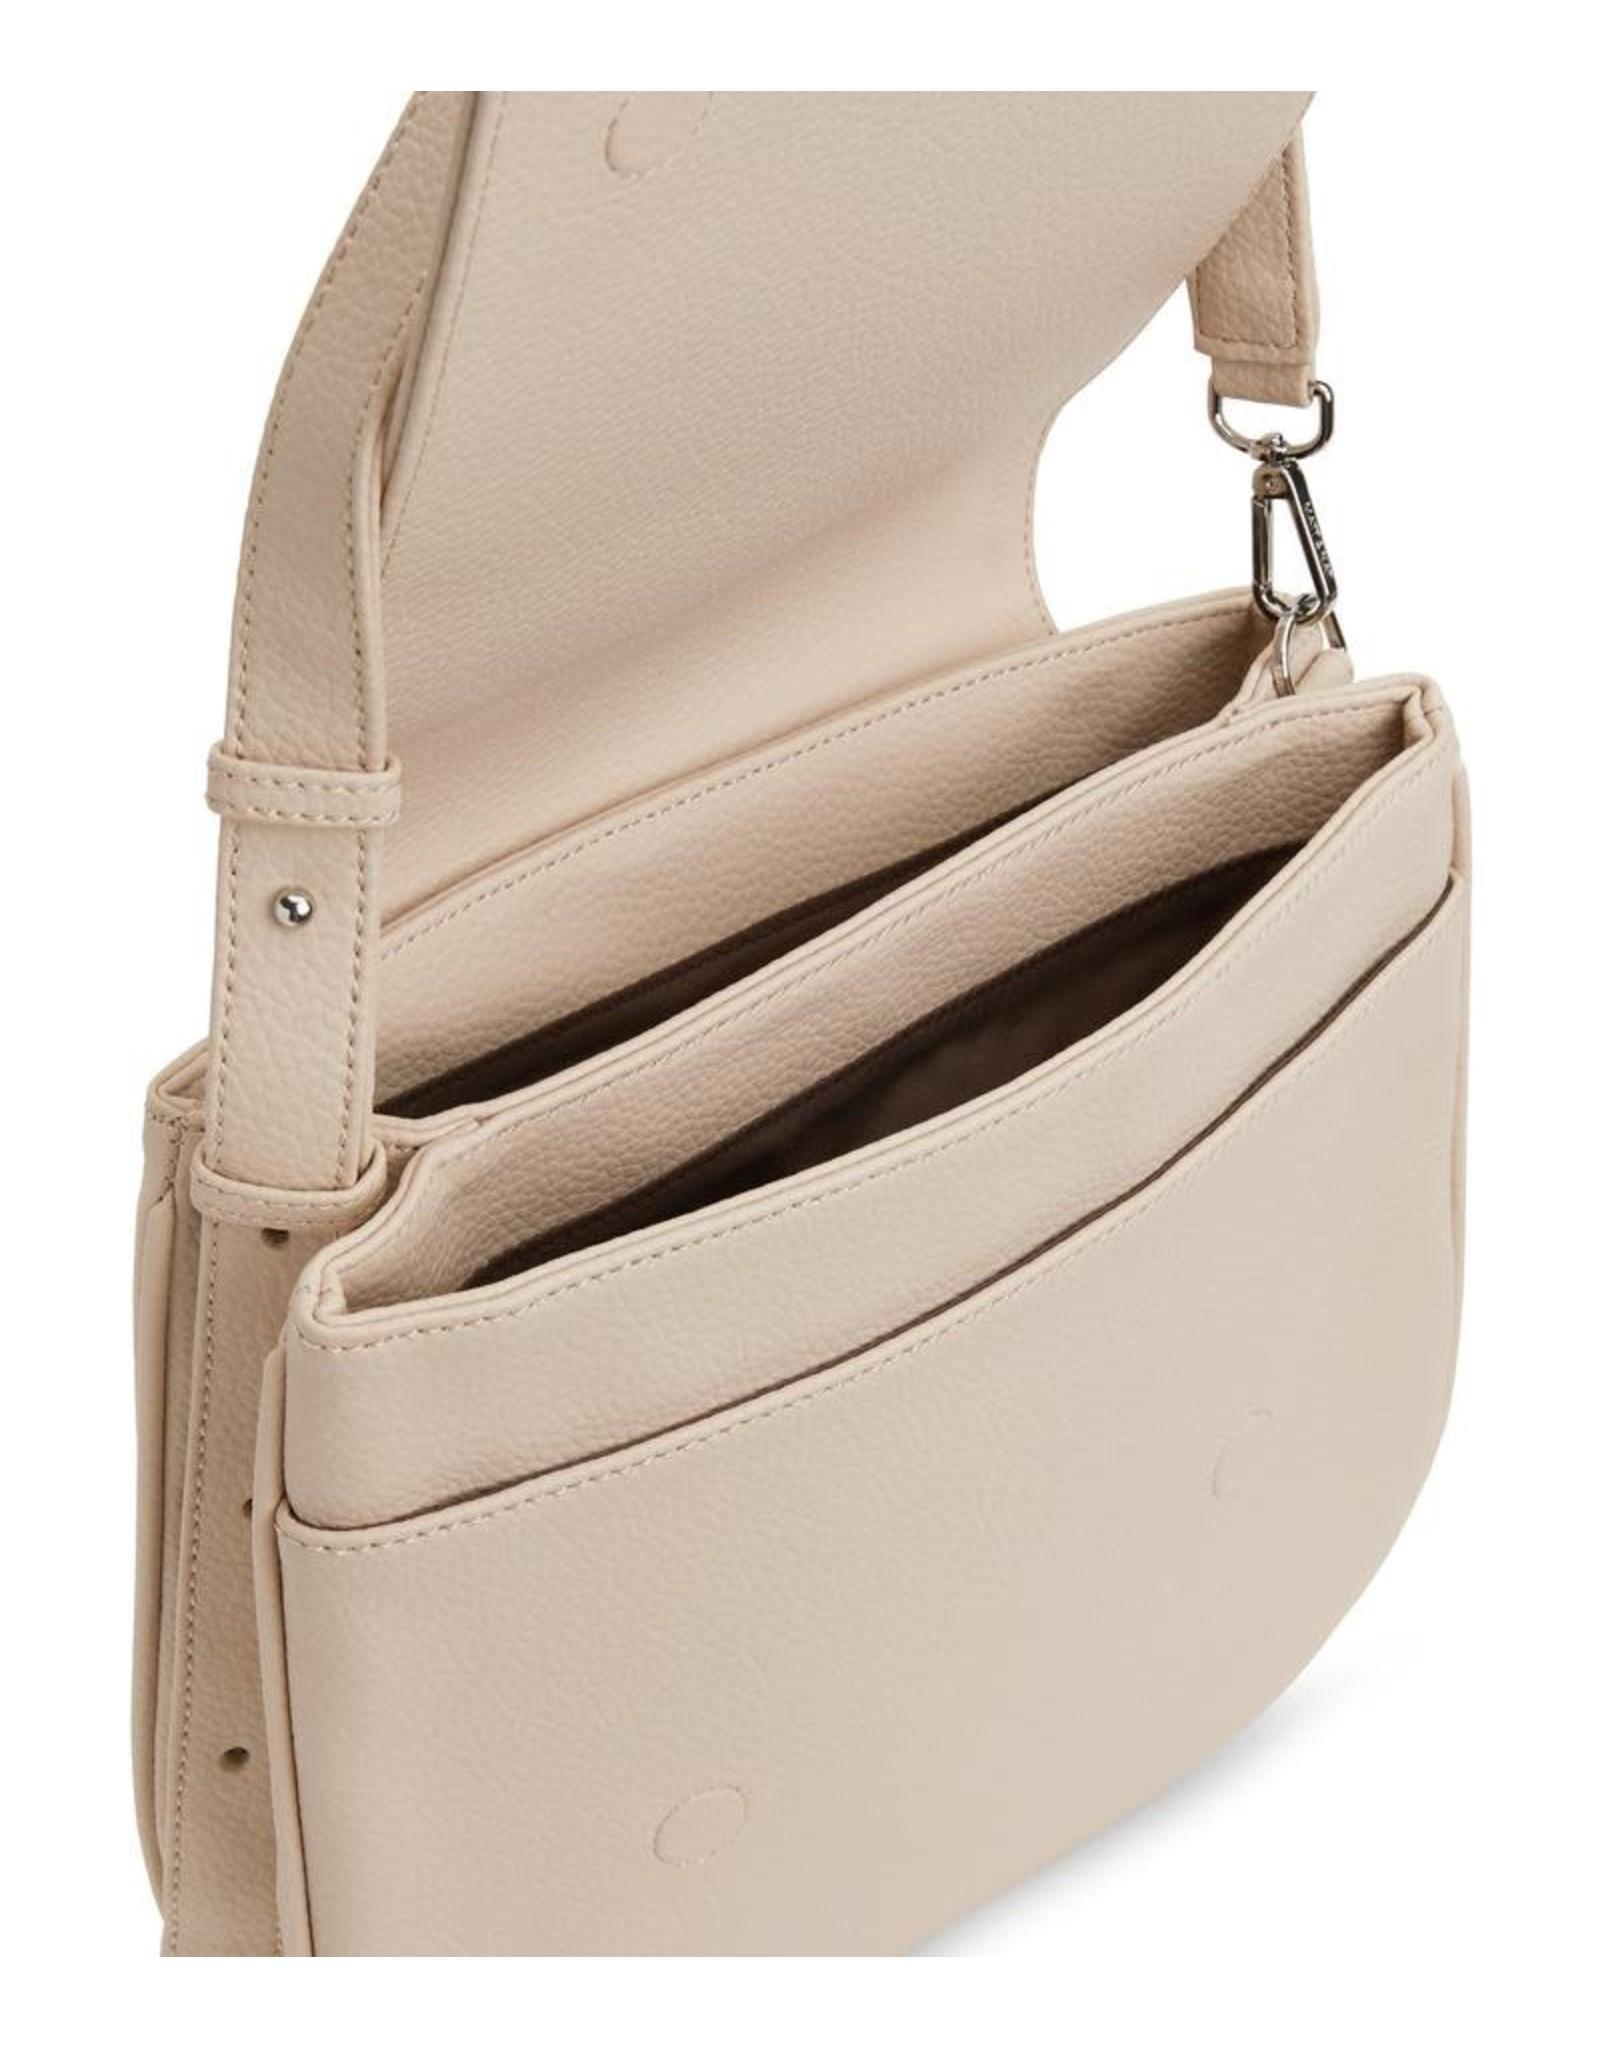 Matt & Nat - Shoulder Bag Match Slim/Opal